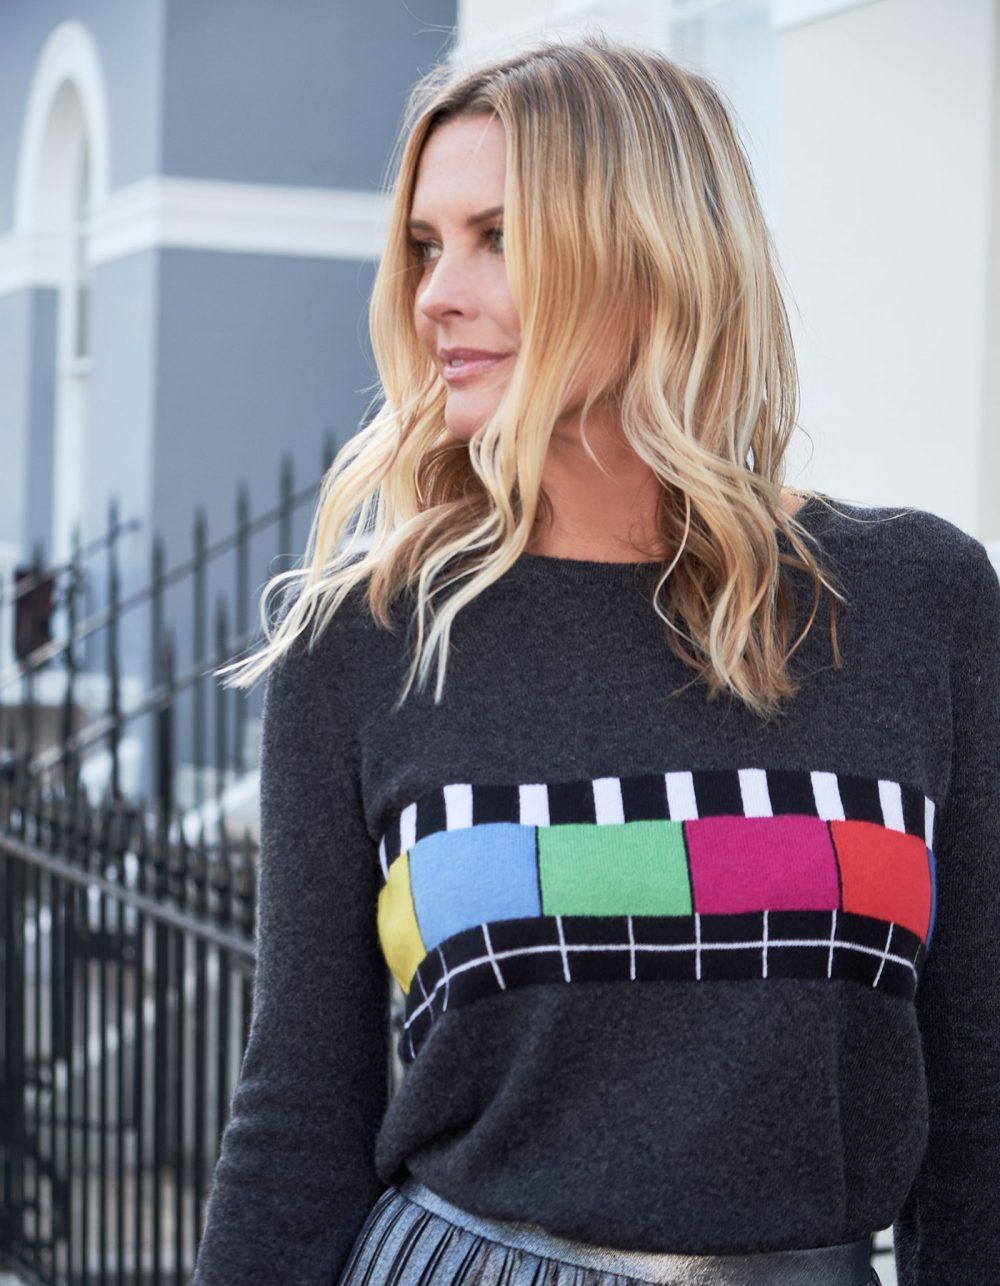 A model on a London street in womens cashmere, the malin darlin Test Bild charcoal cashmere jumper.